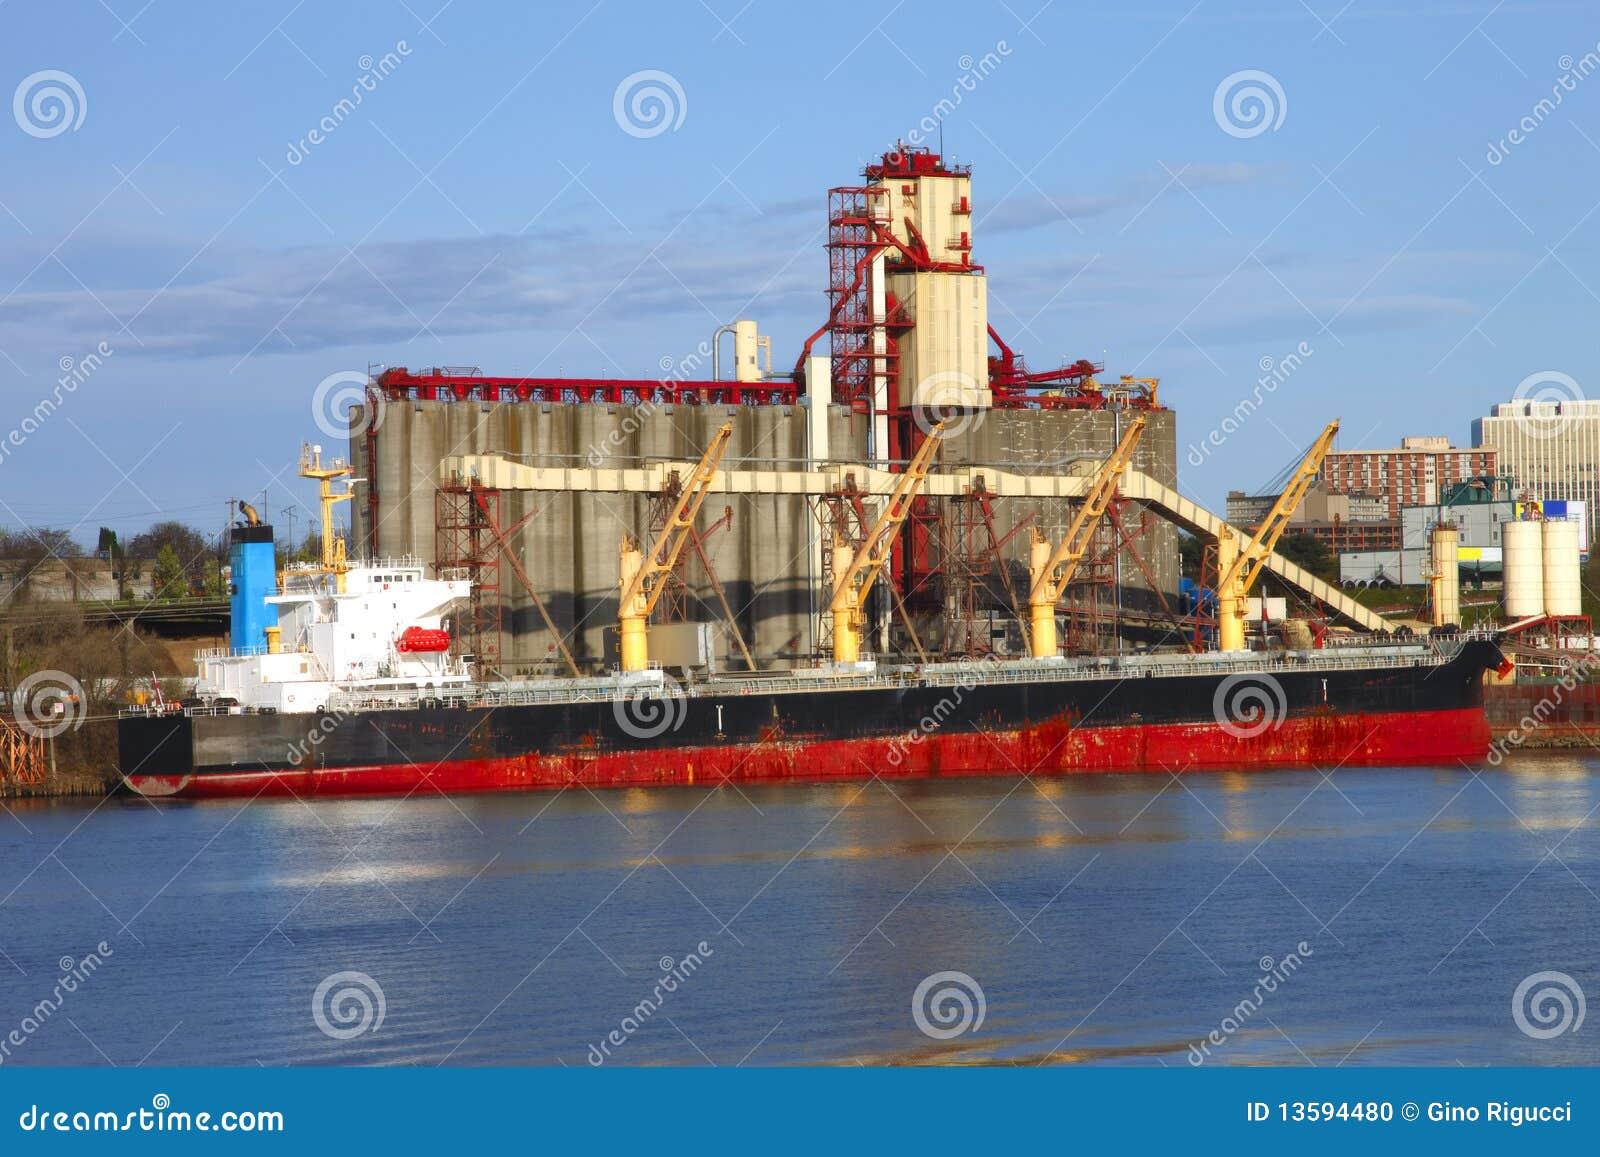 Grain Elevators Amp Cargo Ship Stock Photo Image 13594480